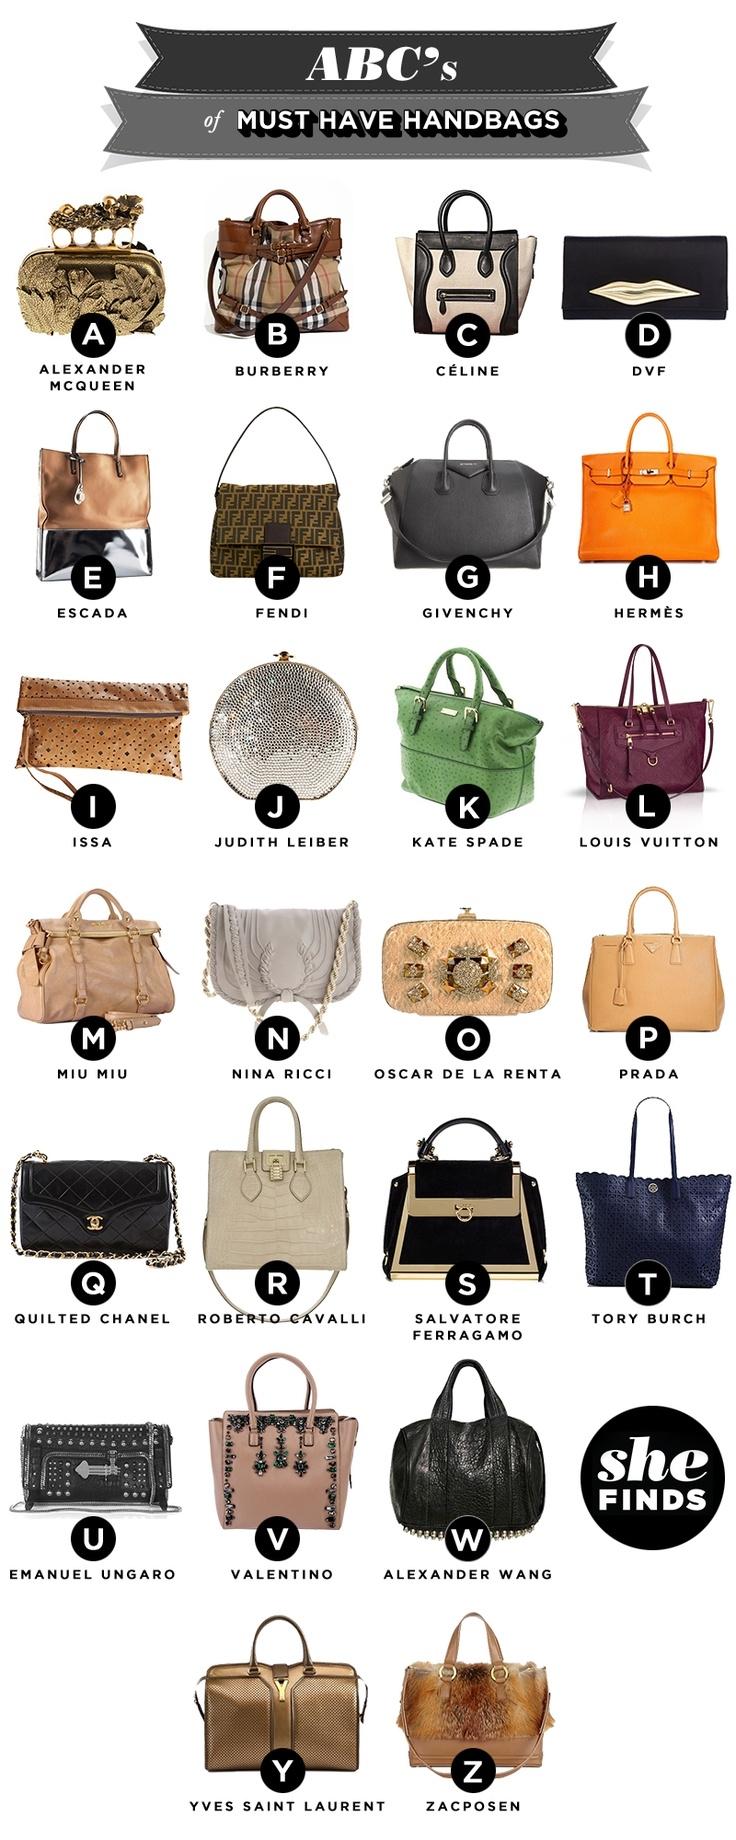 Louis Vuitton clipart guggi Burberry handbags high handbags handbags